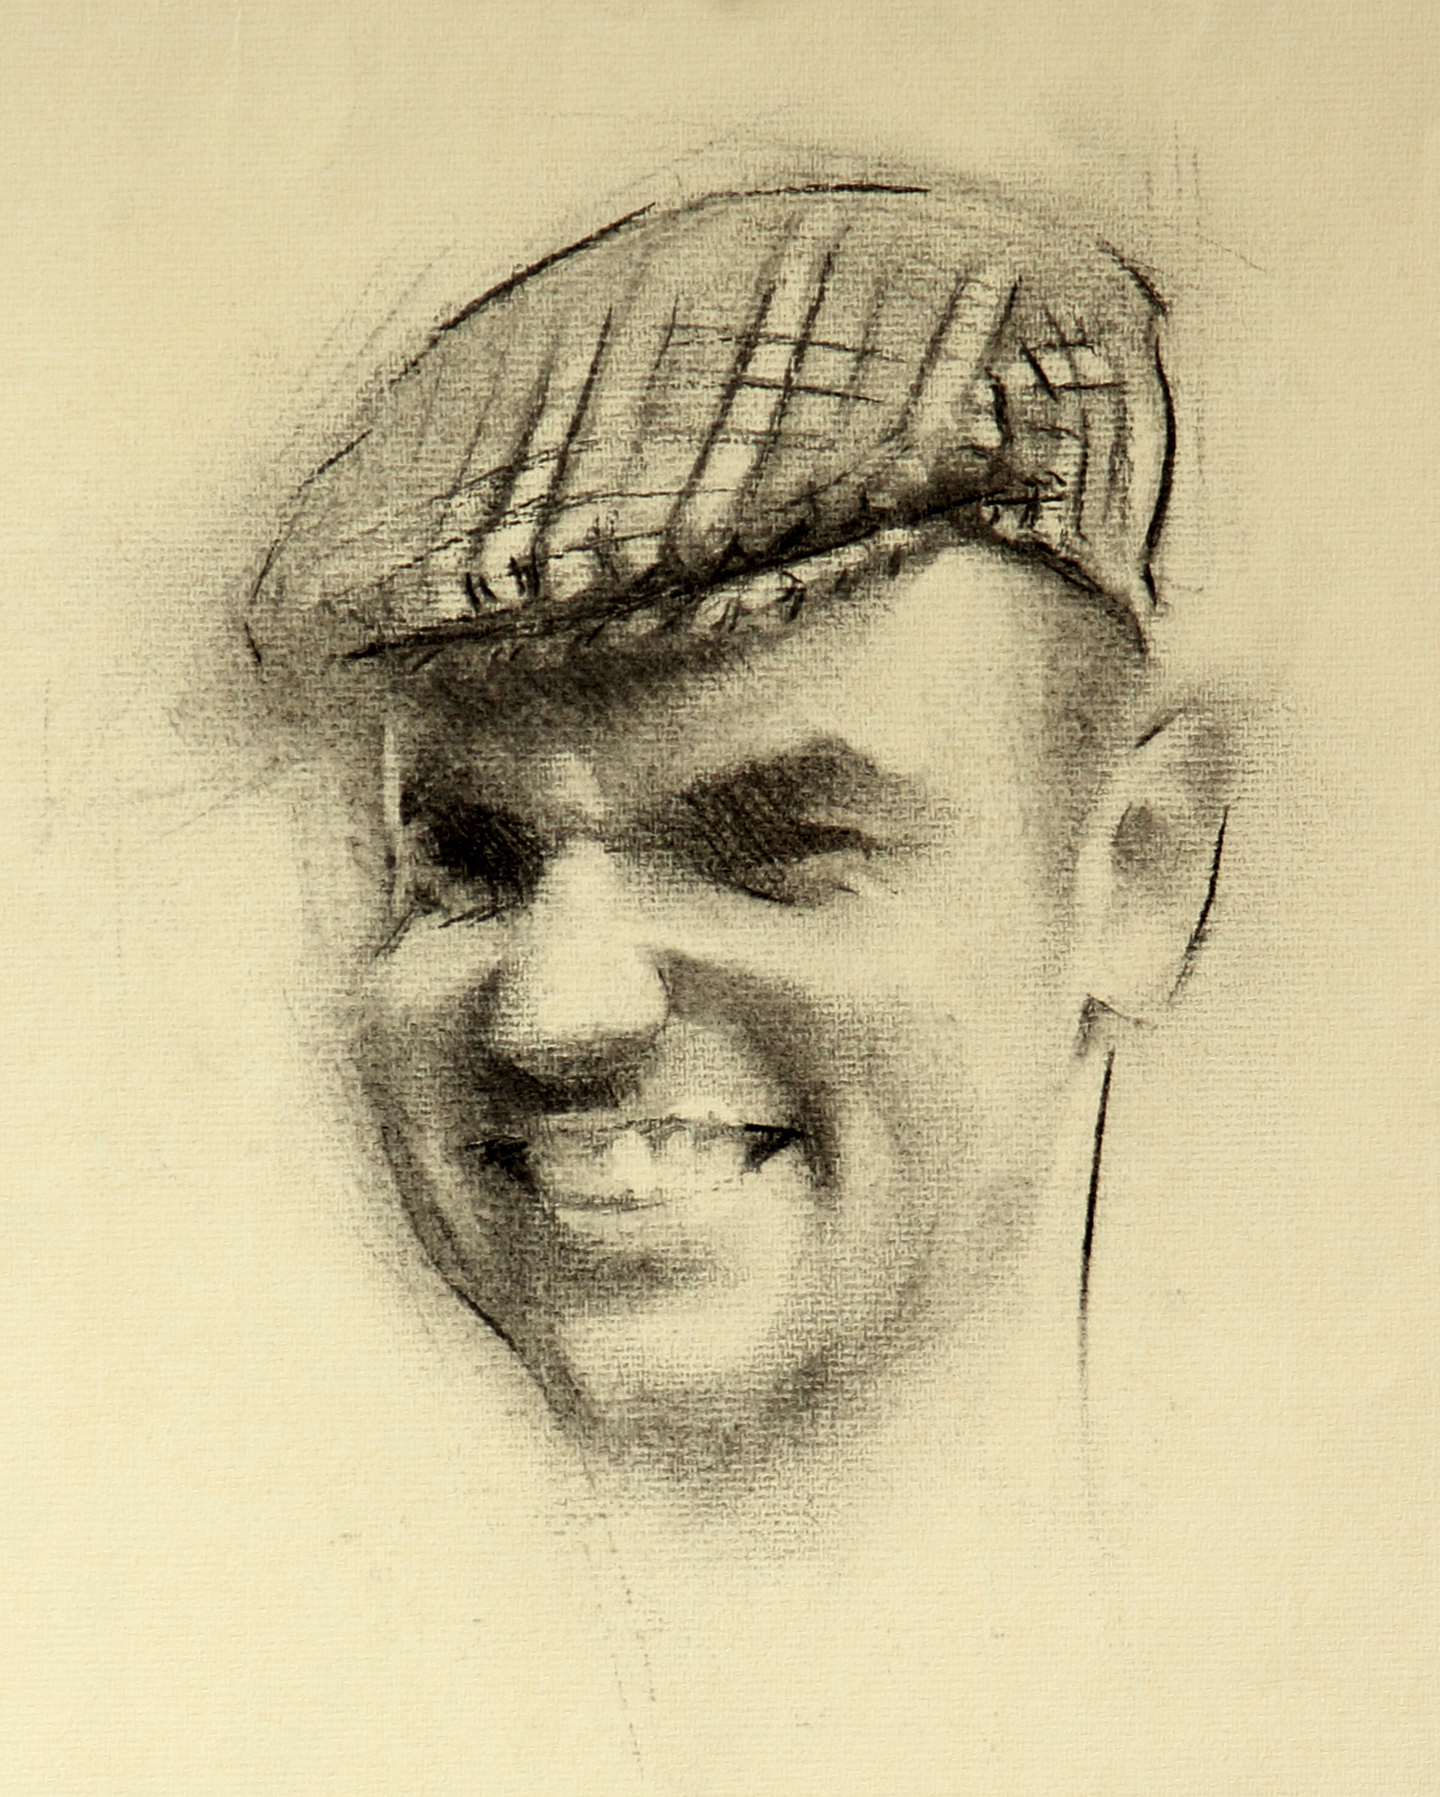 Self Portrait, 2014 Alex Tzavaras Charcoal on paper, 30 x 40 cm